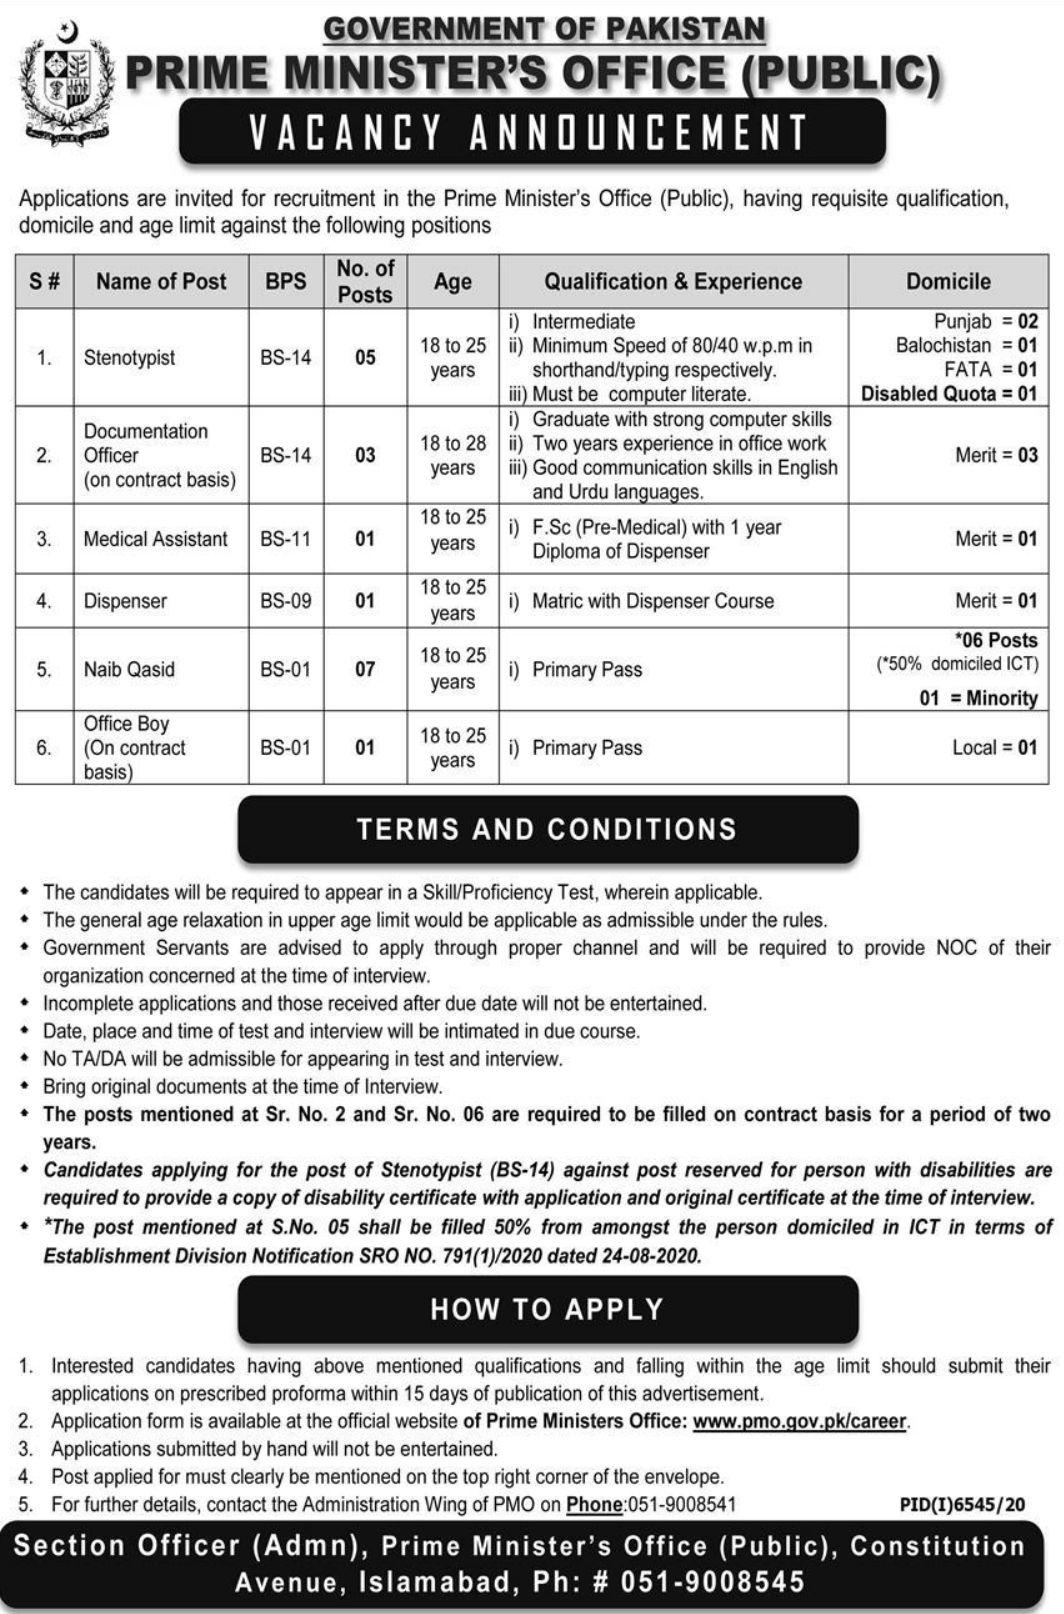 Govt of Pakistan Prime Minister's Office Jobs 2021